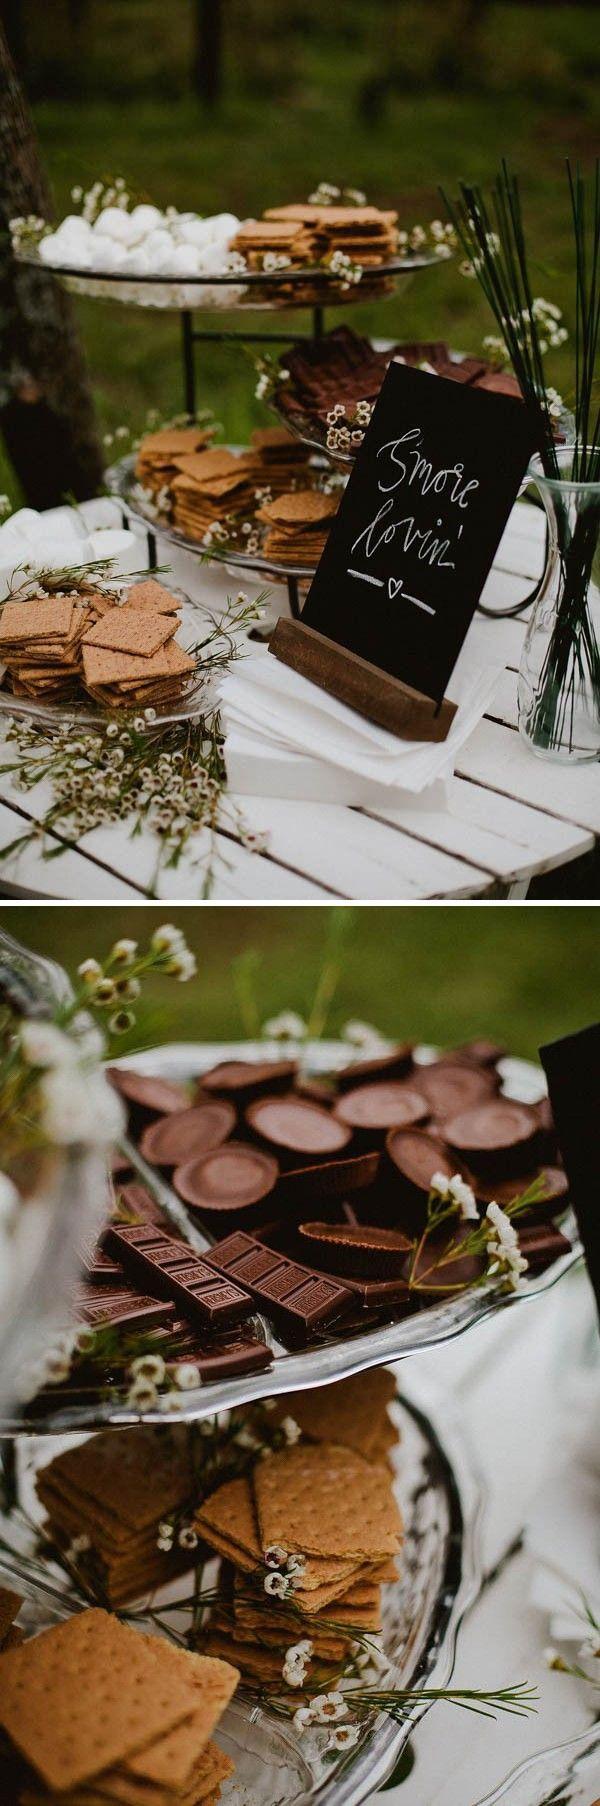 19 Super Sweet Wedding Dessert Displays                                                                                                                                                                                 More